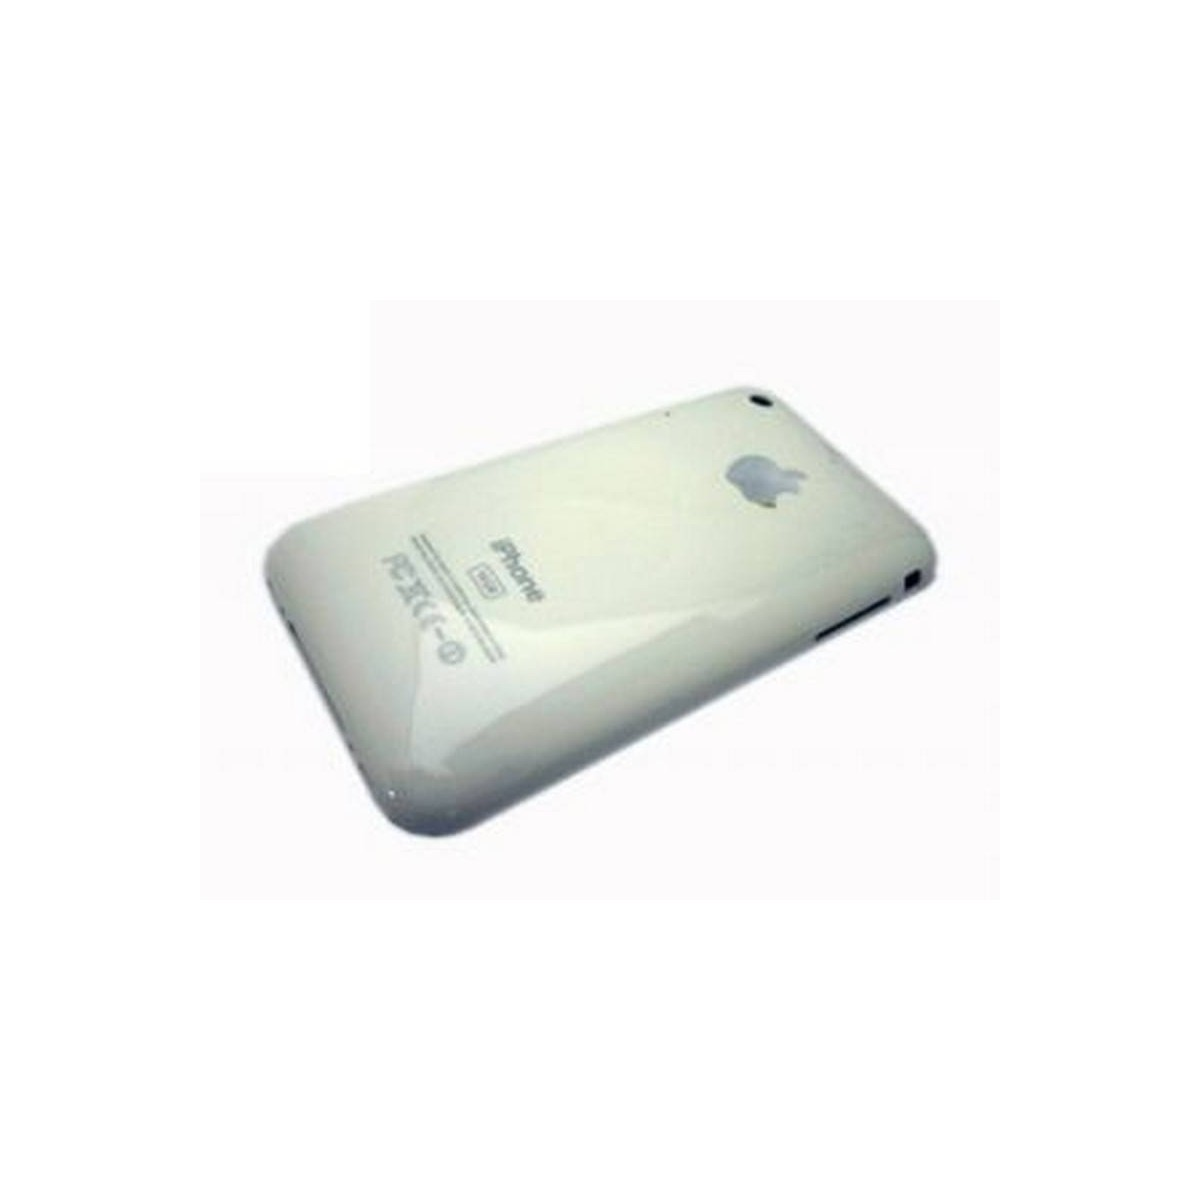 iPhone 3G 8GB carcaça traseira, tapa bateria branca